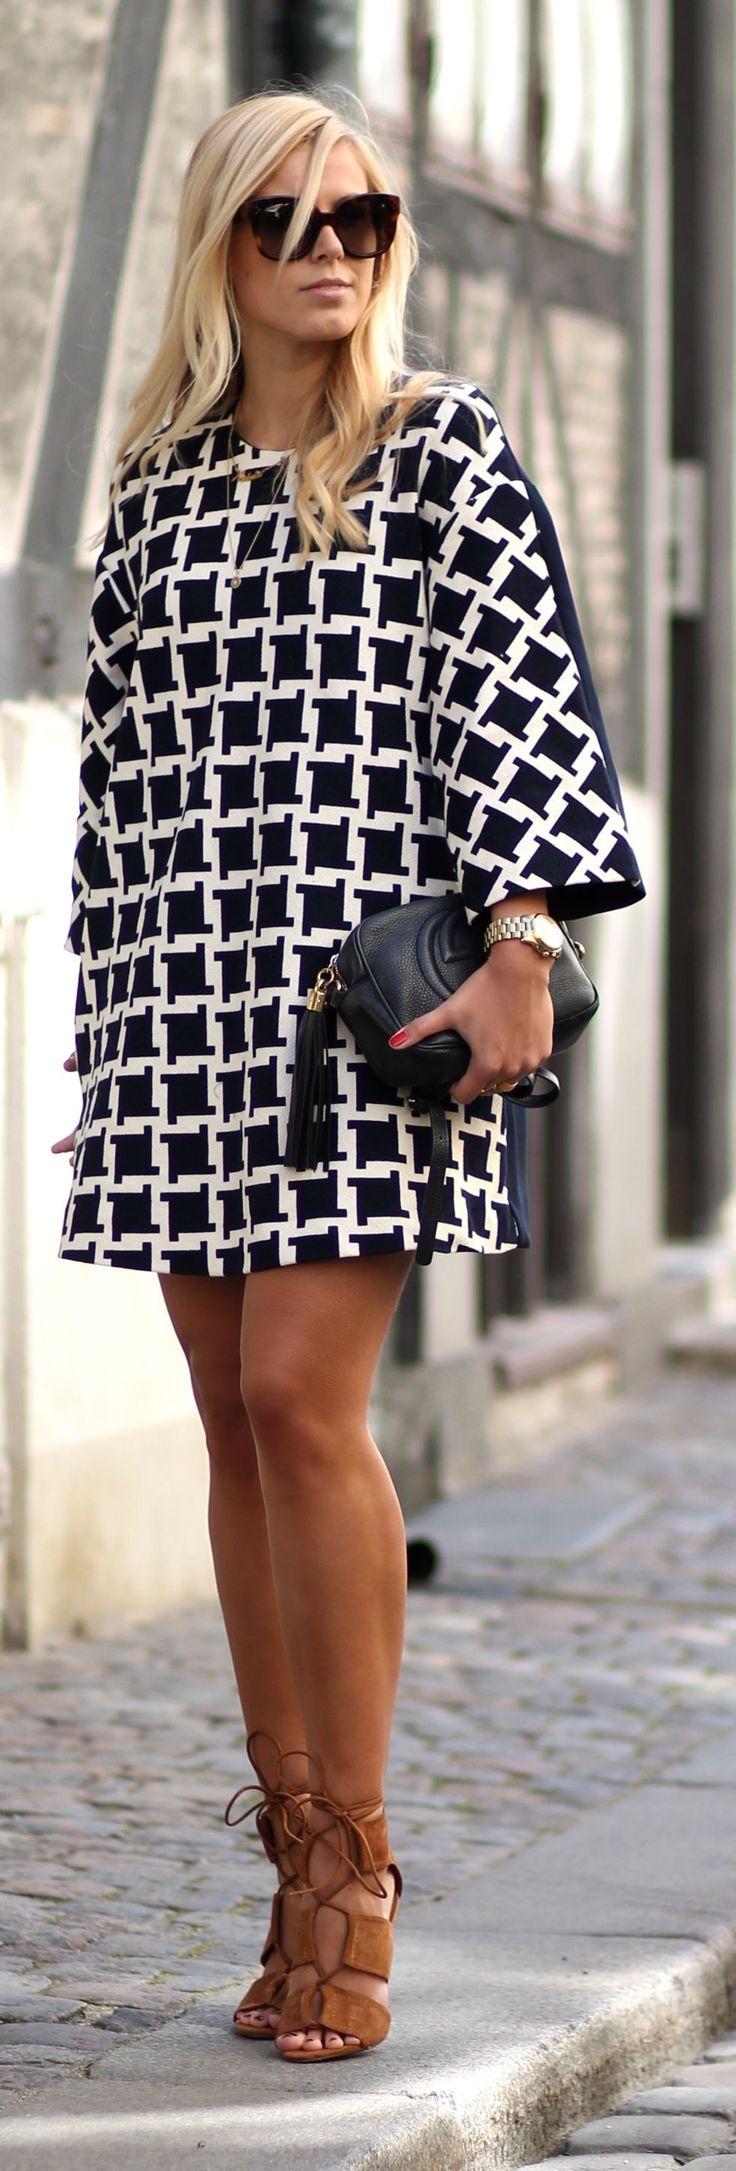 Geo Print Dress Chic Style by Natulia